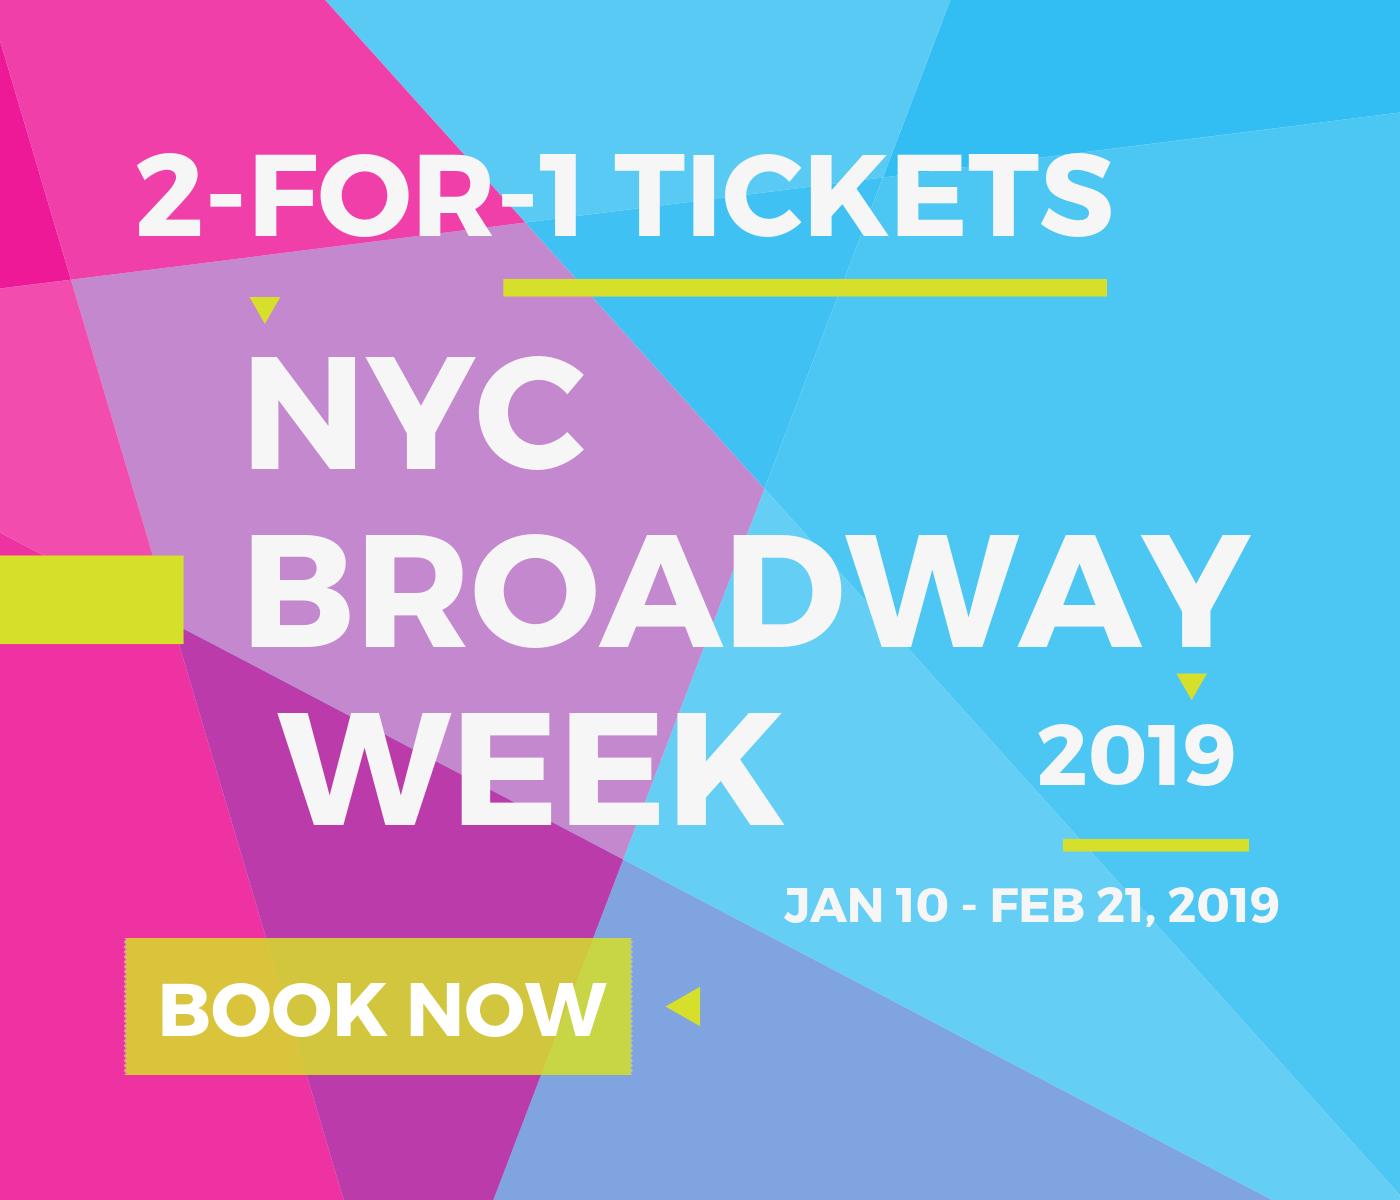 Broadway Week 2019